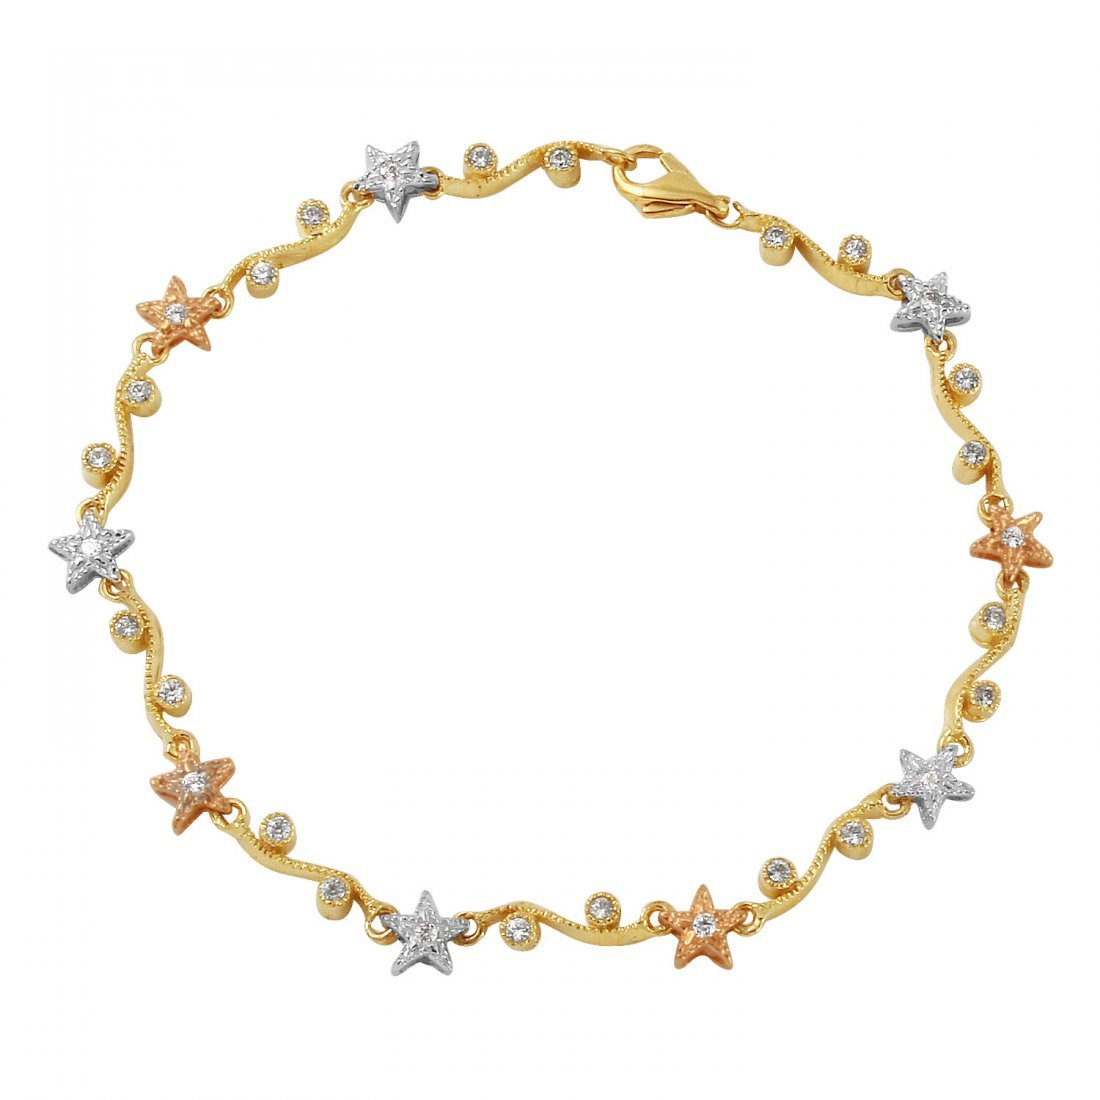 Ladies Cubic Zirconia 14K Three tone Gold Bracelet